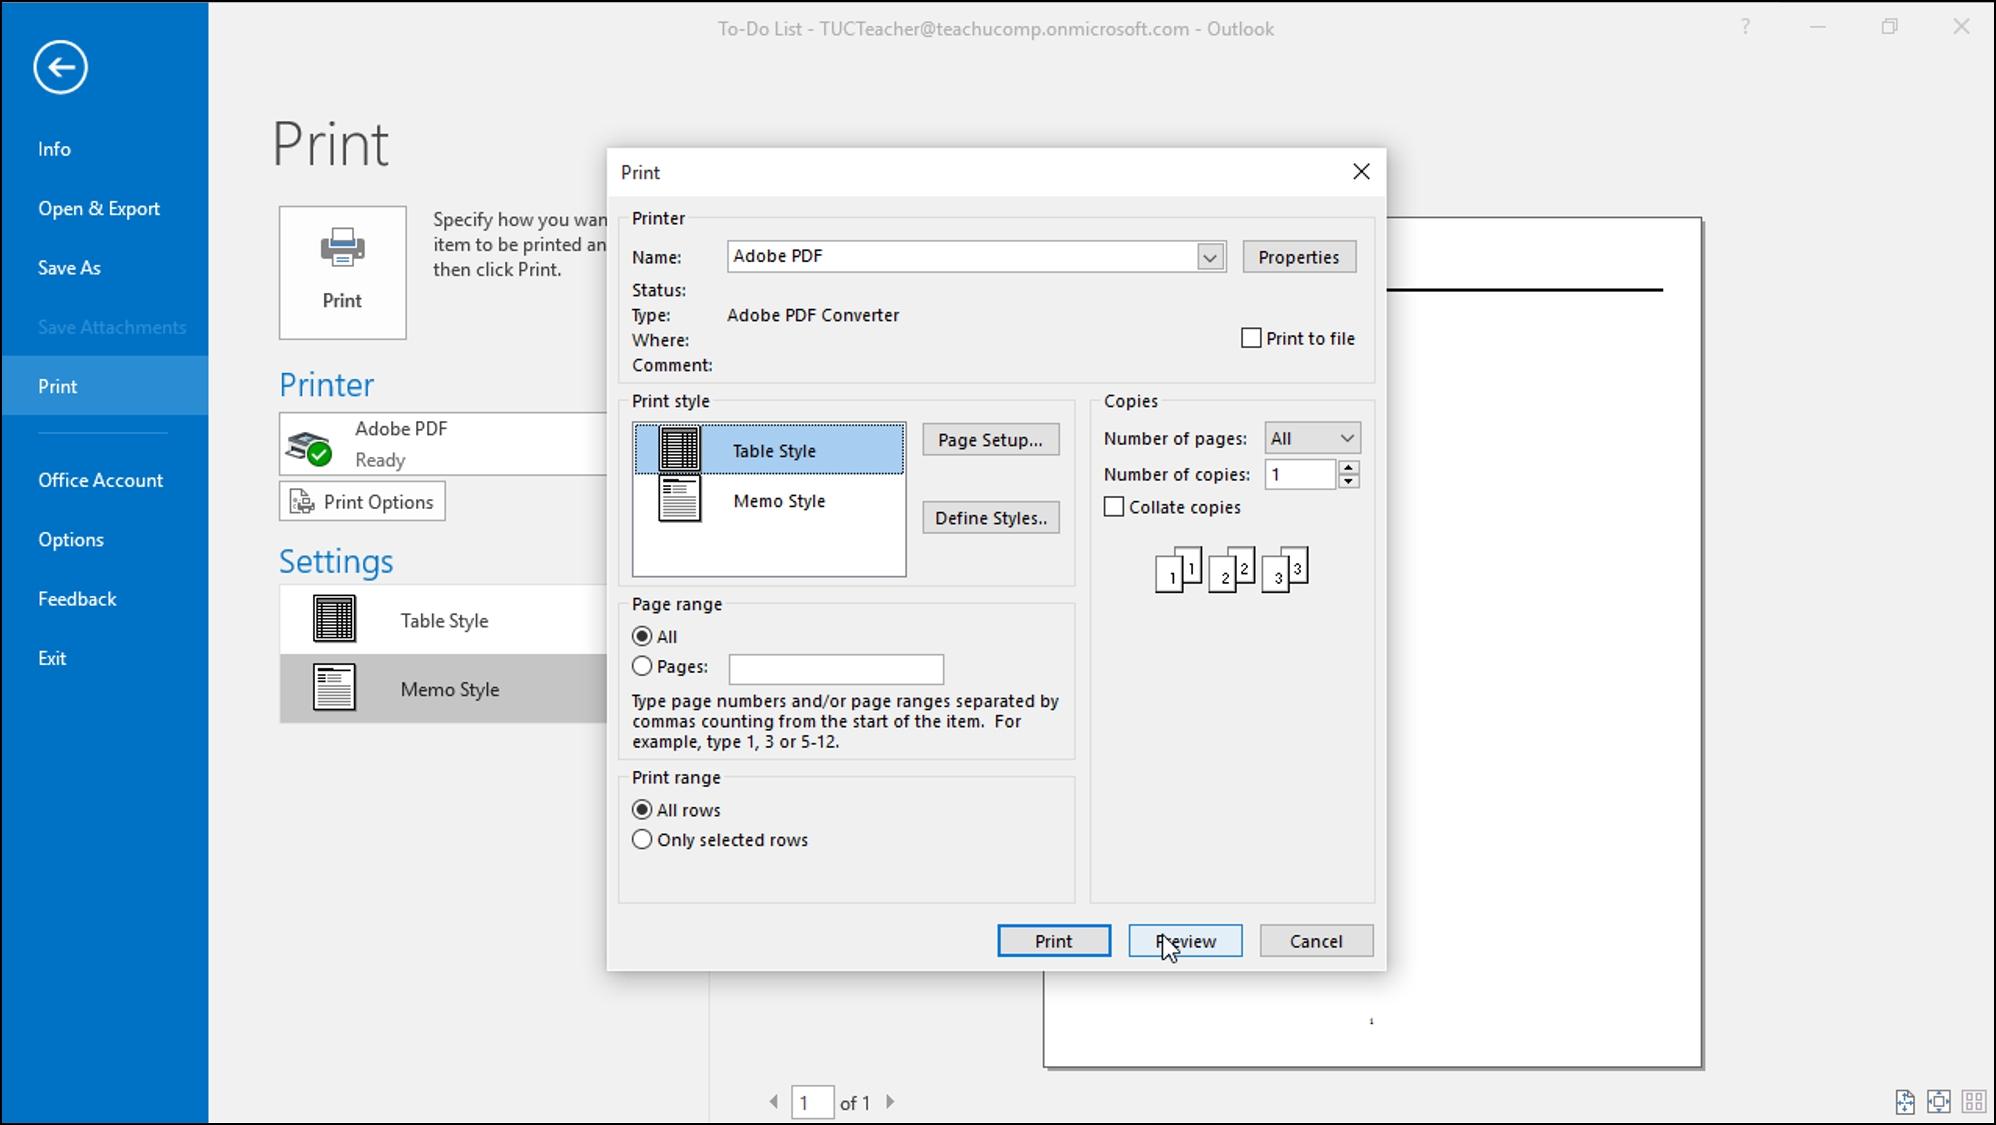 Print Tasks In Outlook - Tutorial - Teachucomp, Inc.